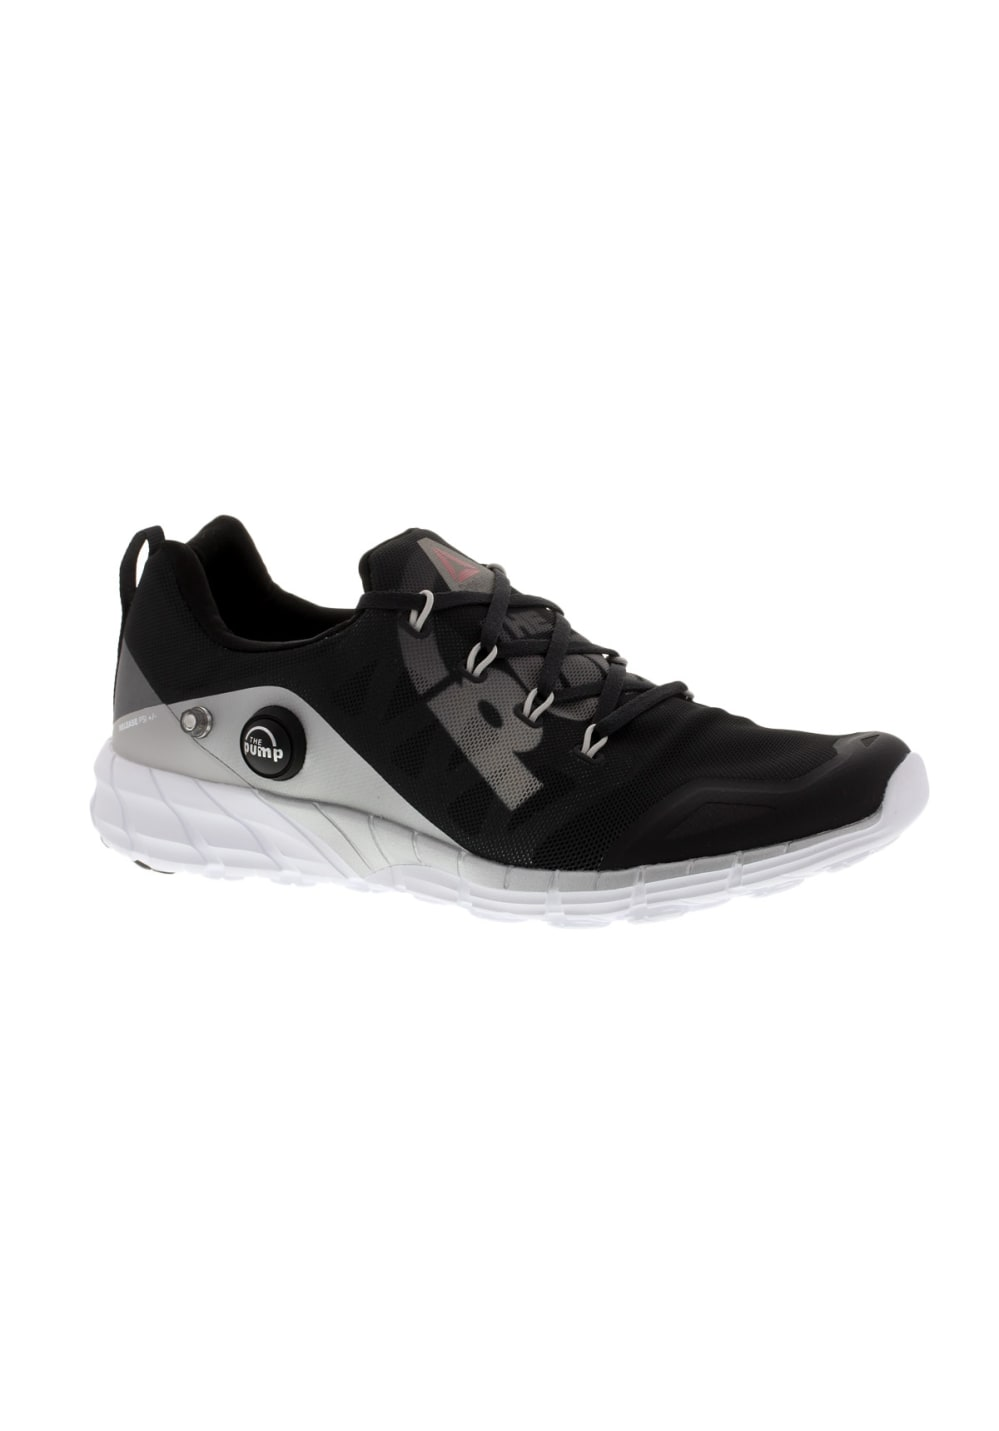 672a42dc86eb90 Next. -60%. Reebok. ZPump Fusion 2.0 Ele - Running shoes for Women